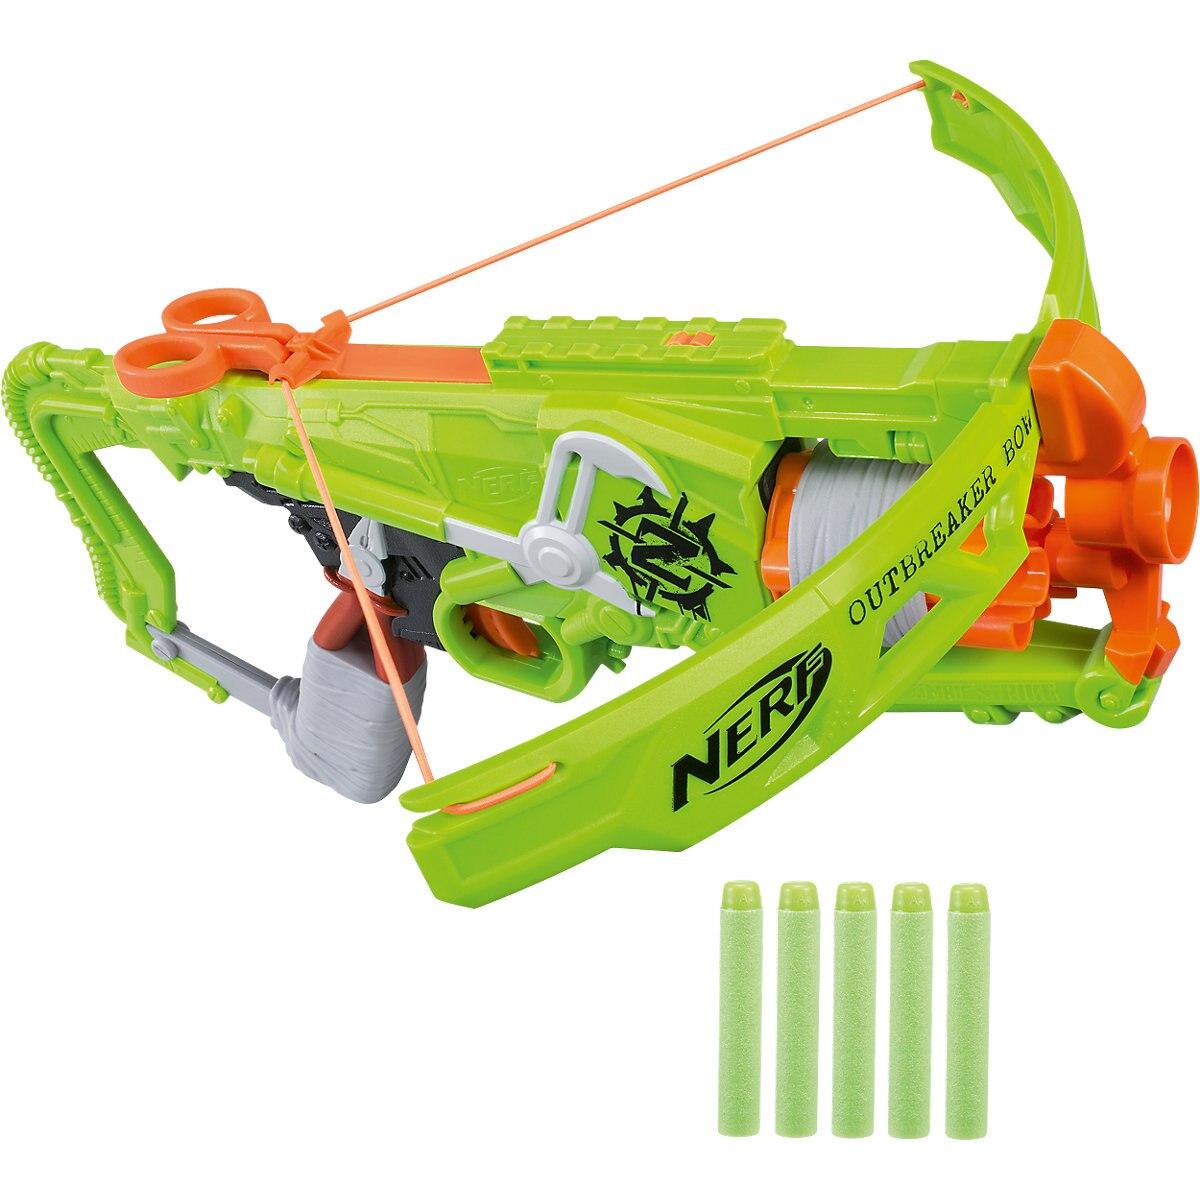 NERF jouet pistolets 5358590 pistolet arme jouets jeux pneumatique blaster garçon orbiz revolver plein air plaisir sport MTpromo